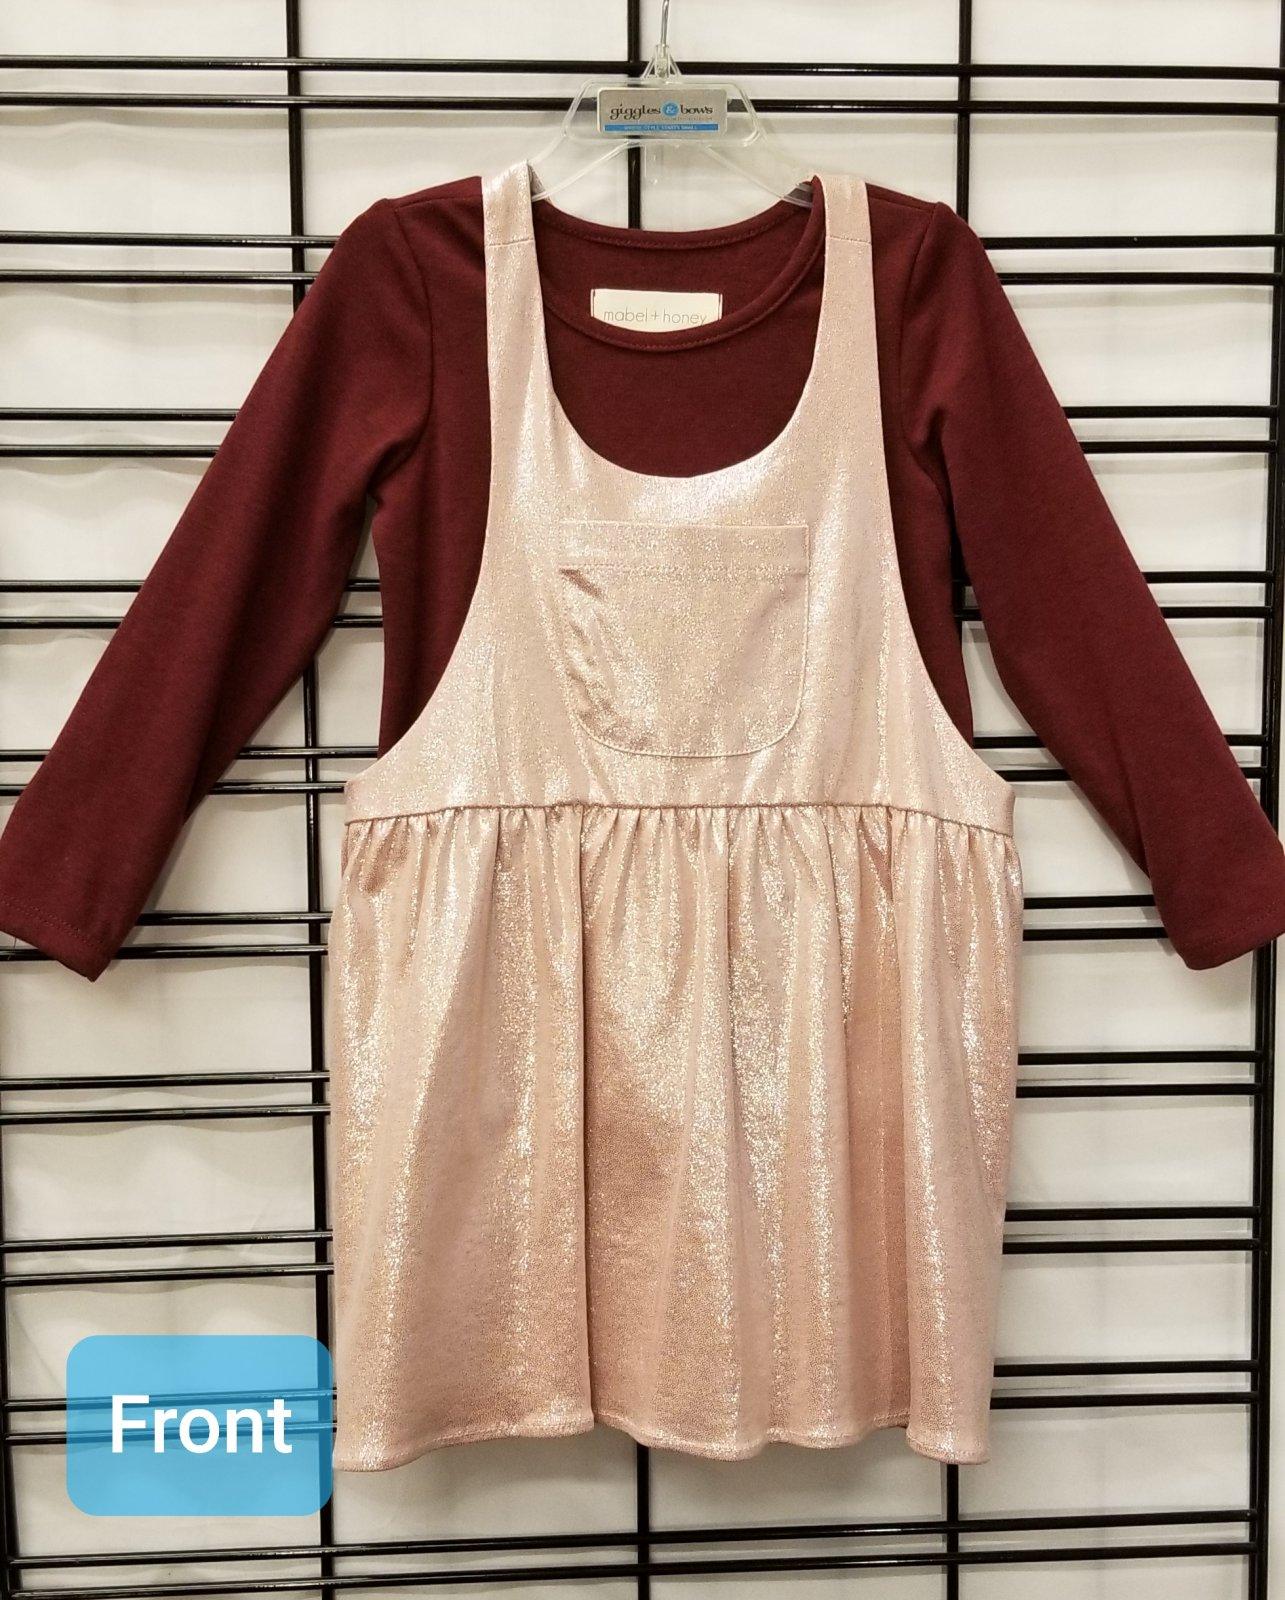 MABEL & HONEY - Pink/berry dress jumper